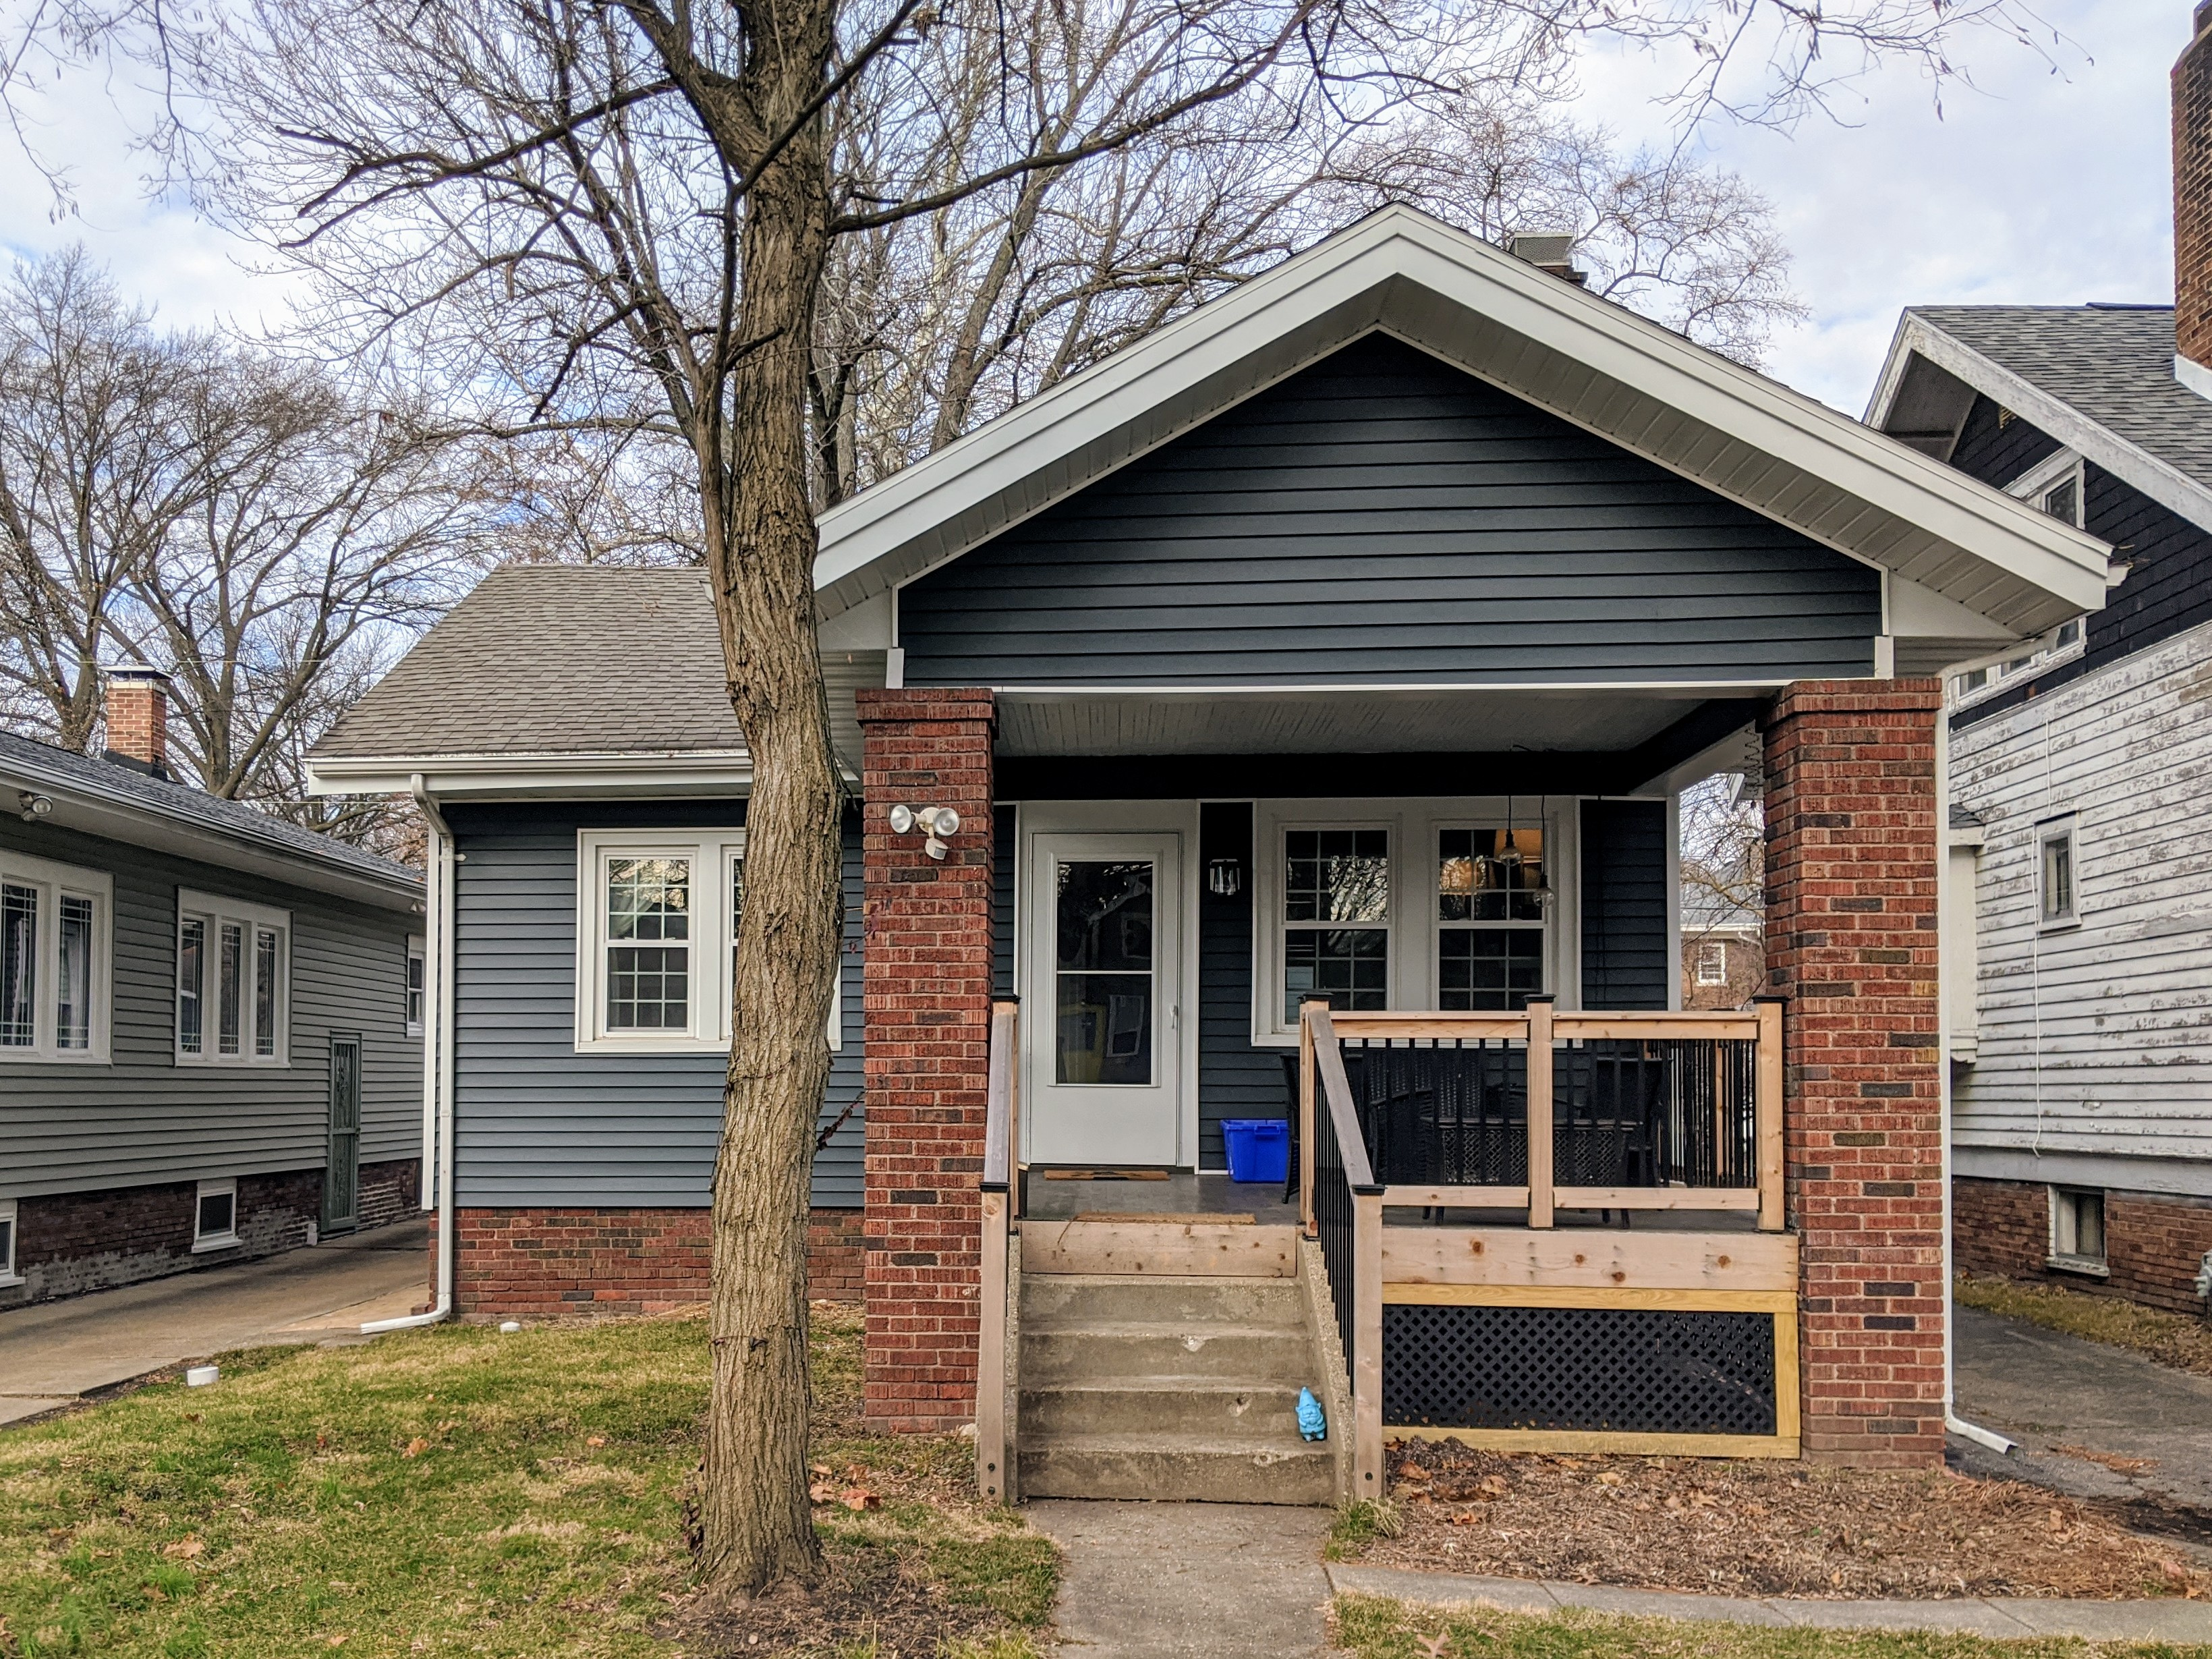 637 W Woodland Ave, Springfield, IL 62704